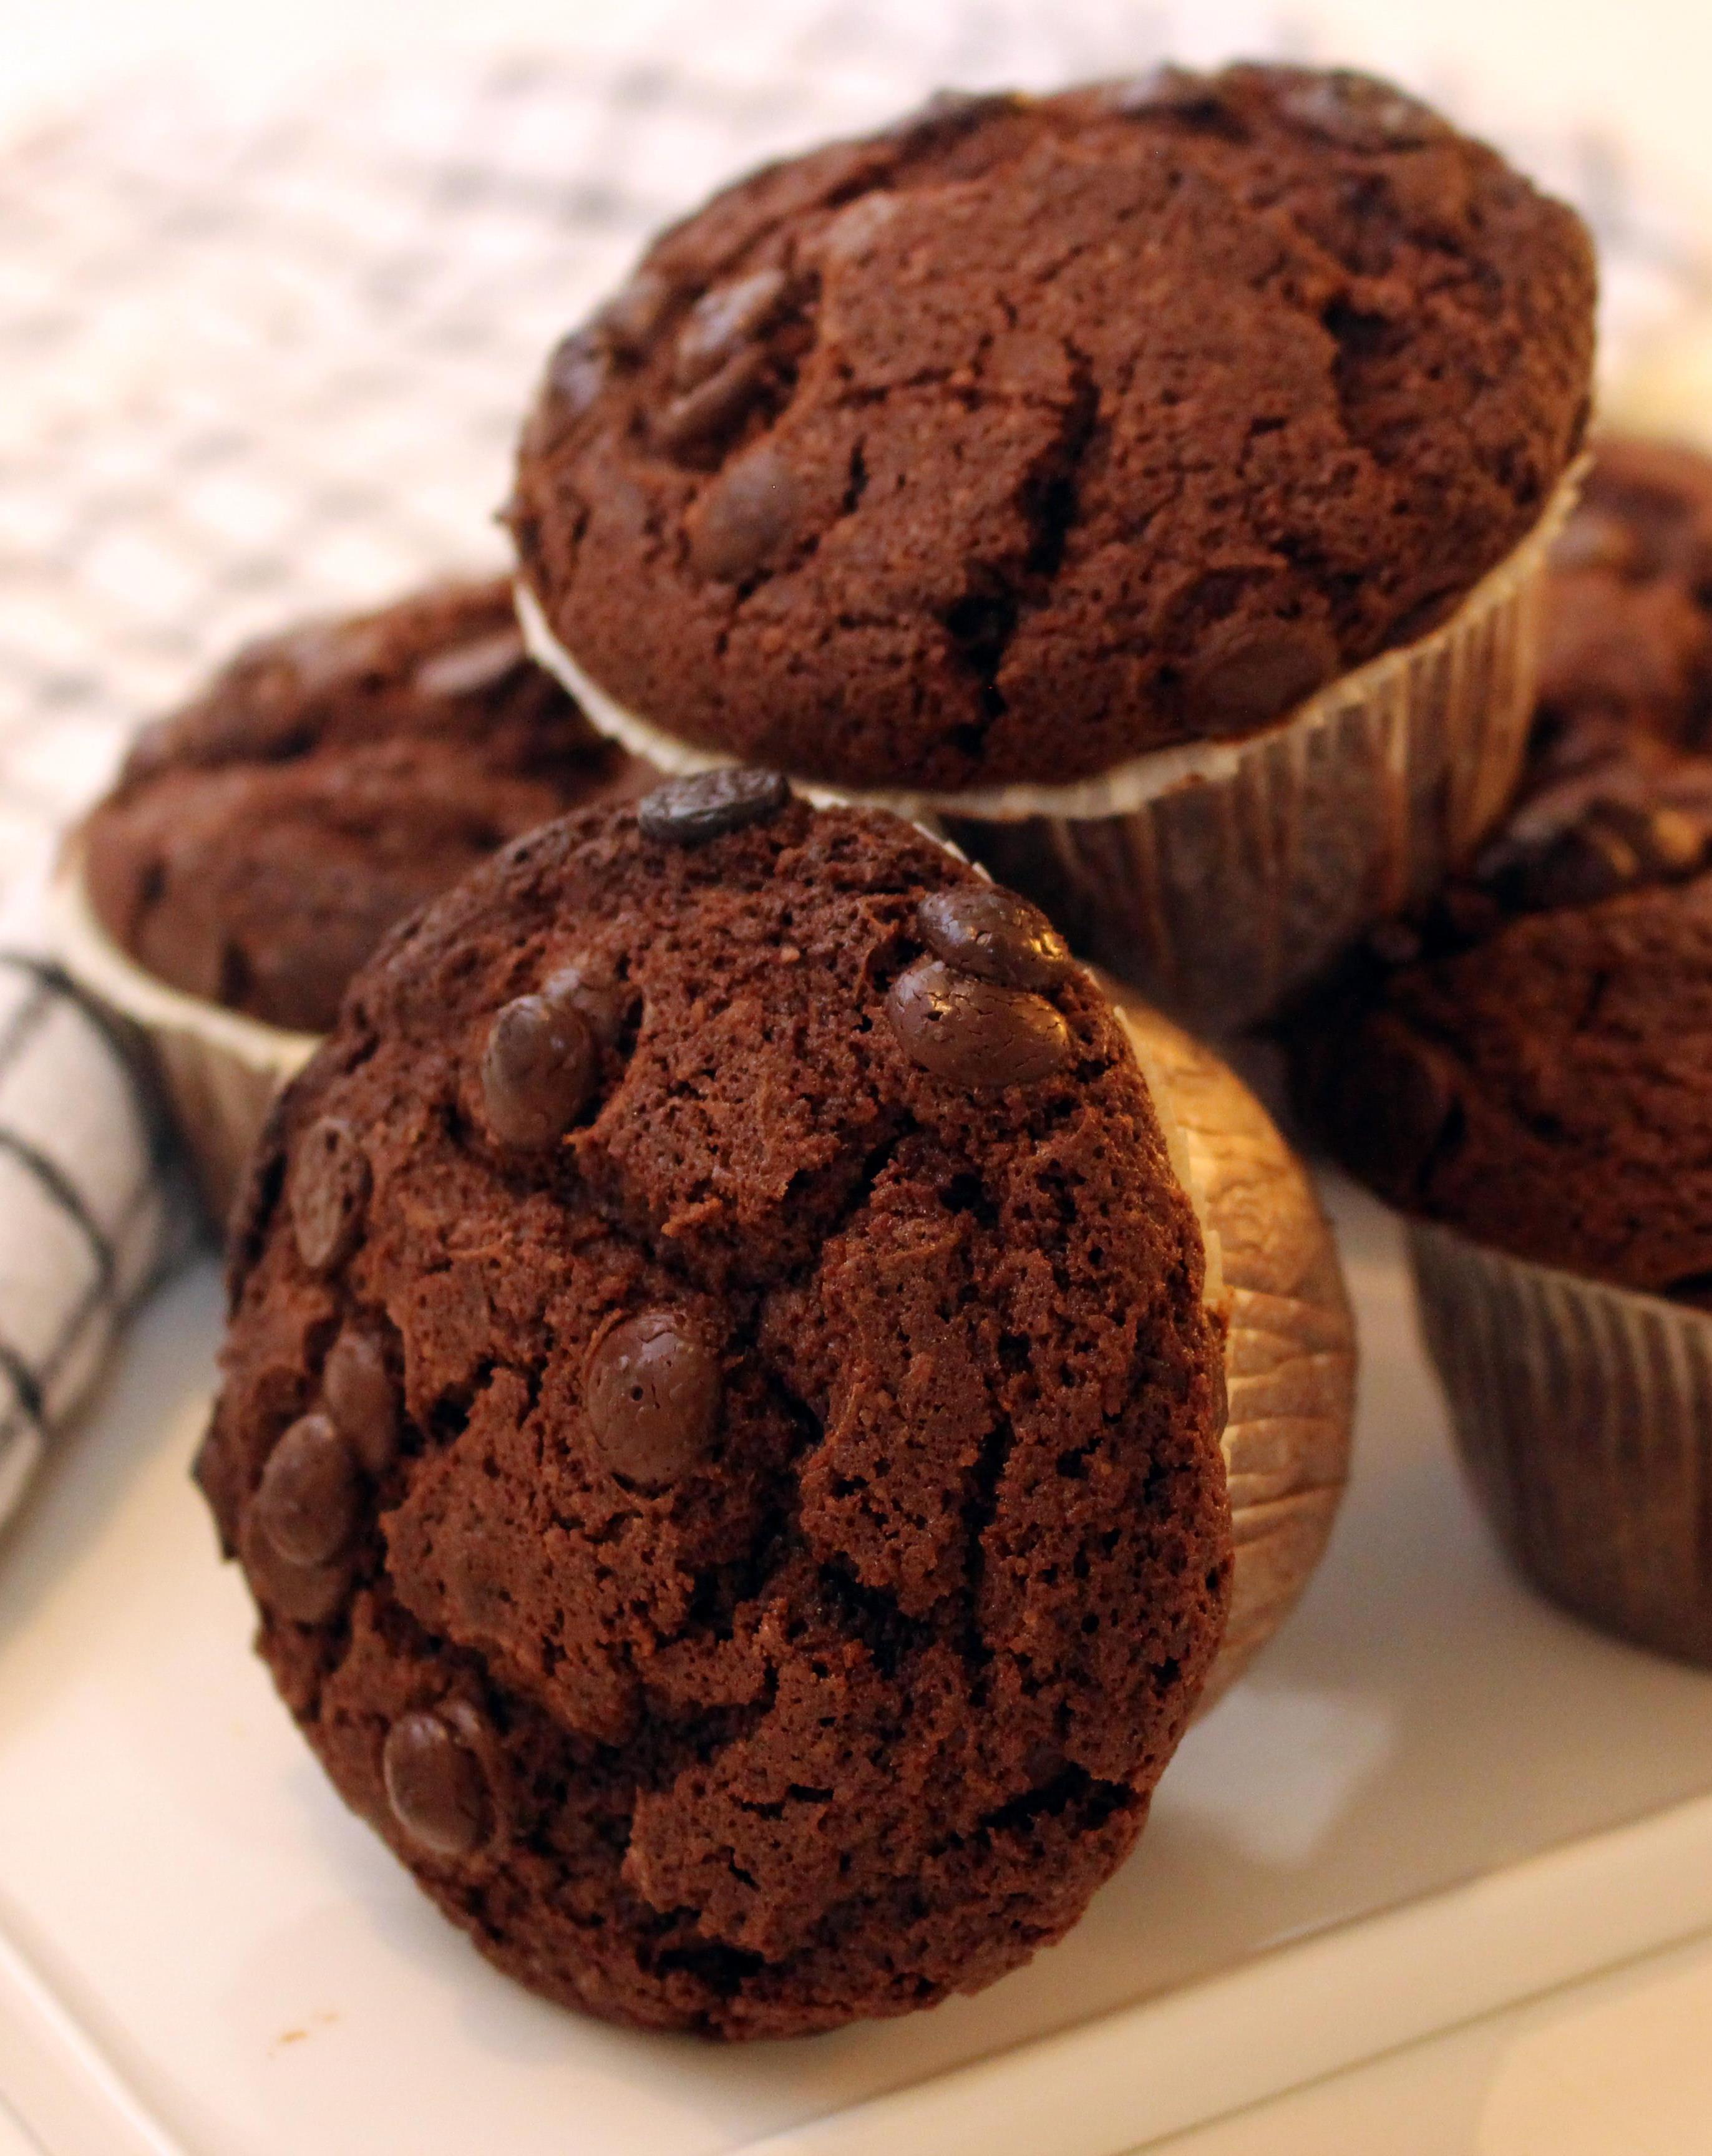 stora chokladmuffins nära